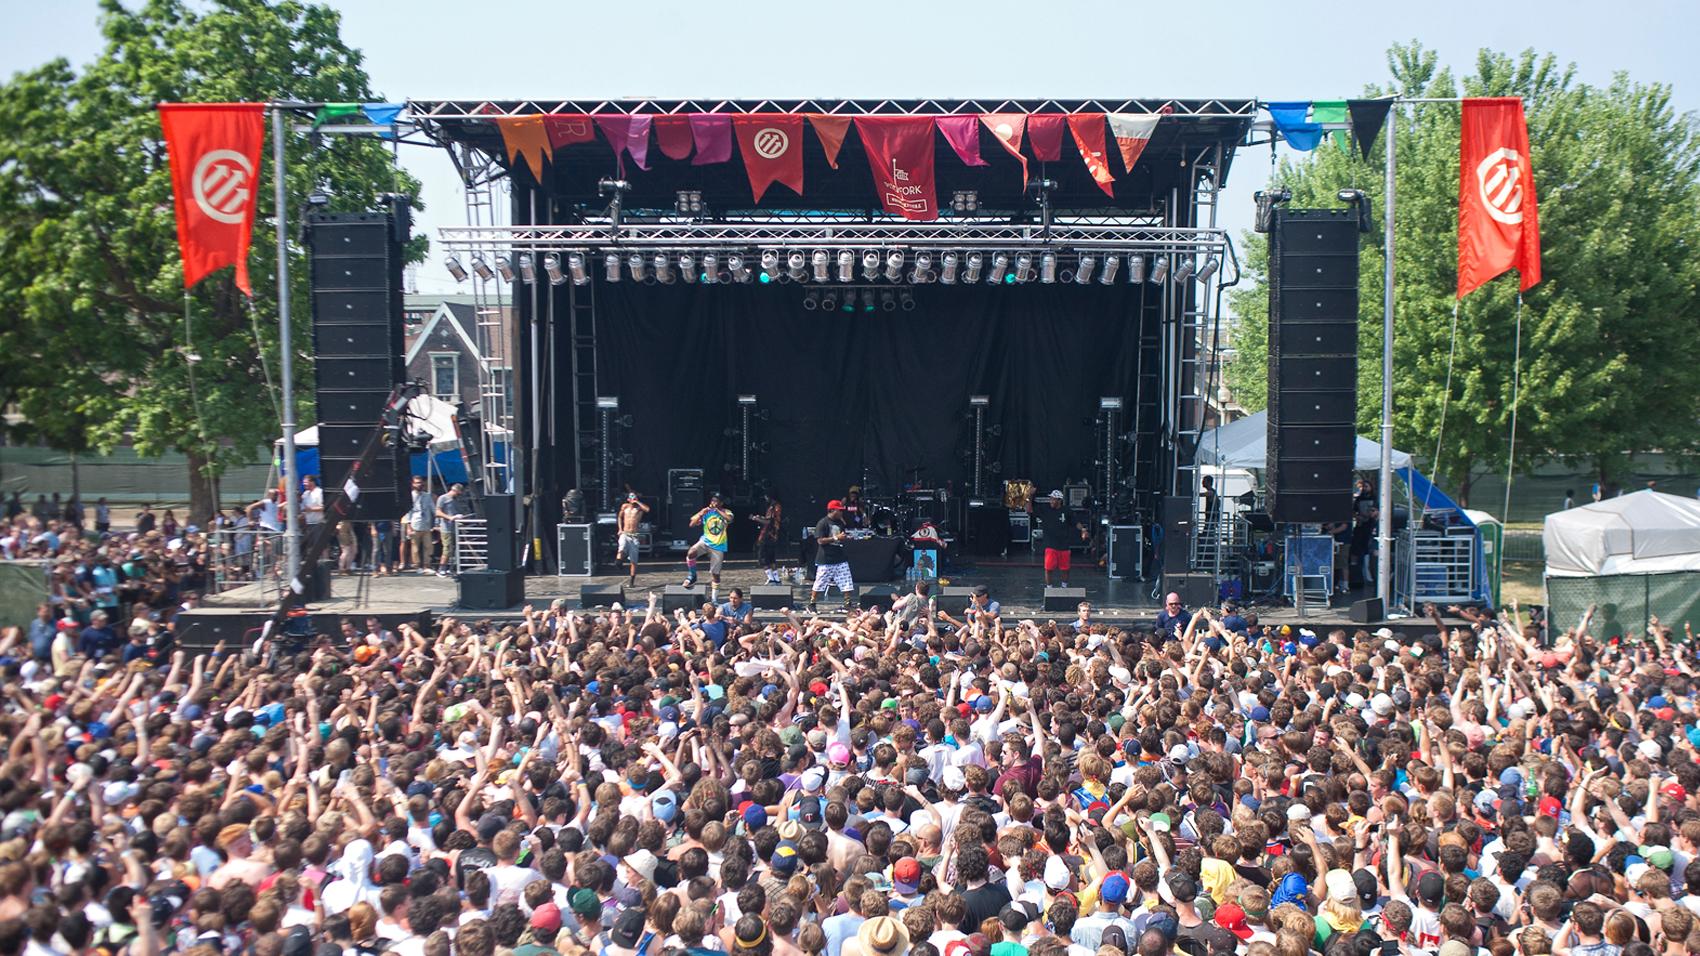 riot fest staff picks for pitchfork music festival - riot fest